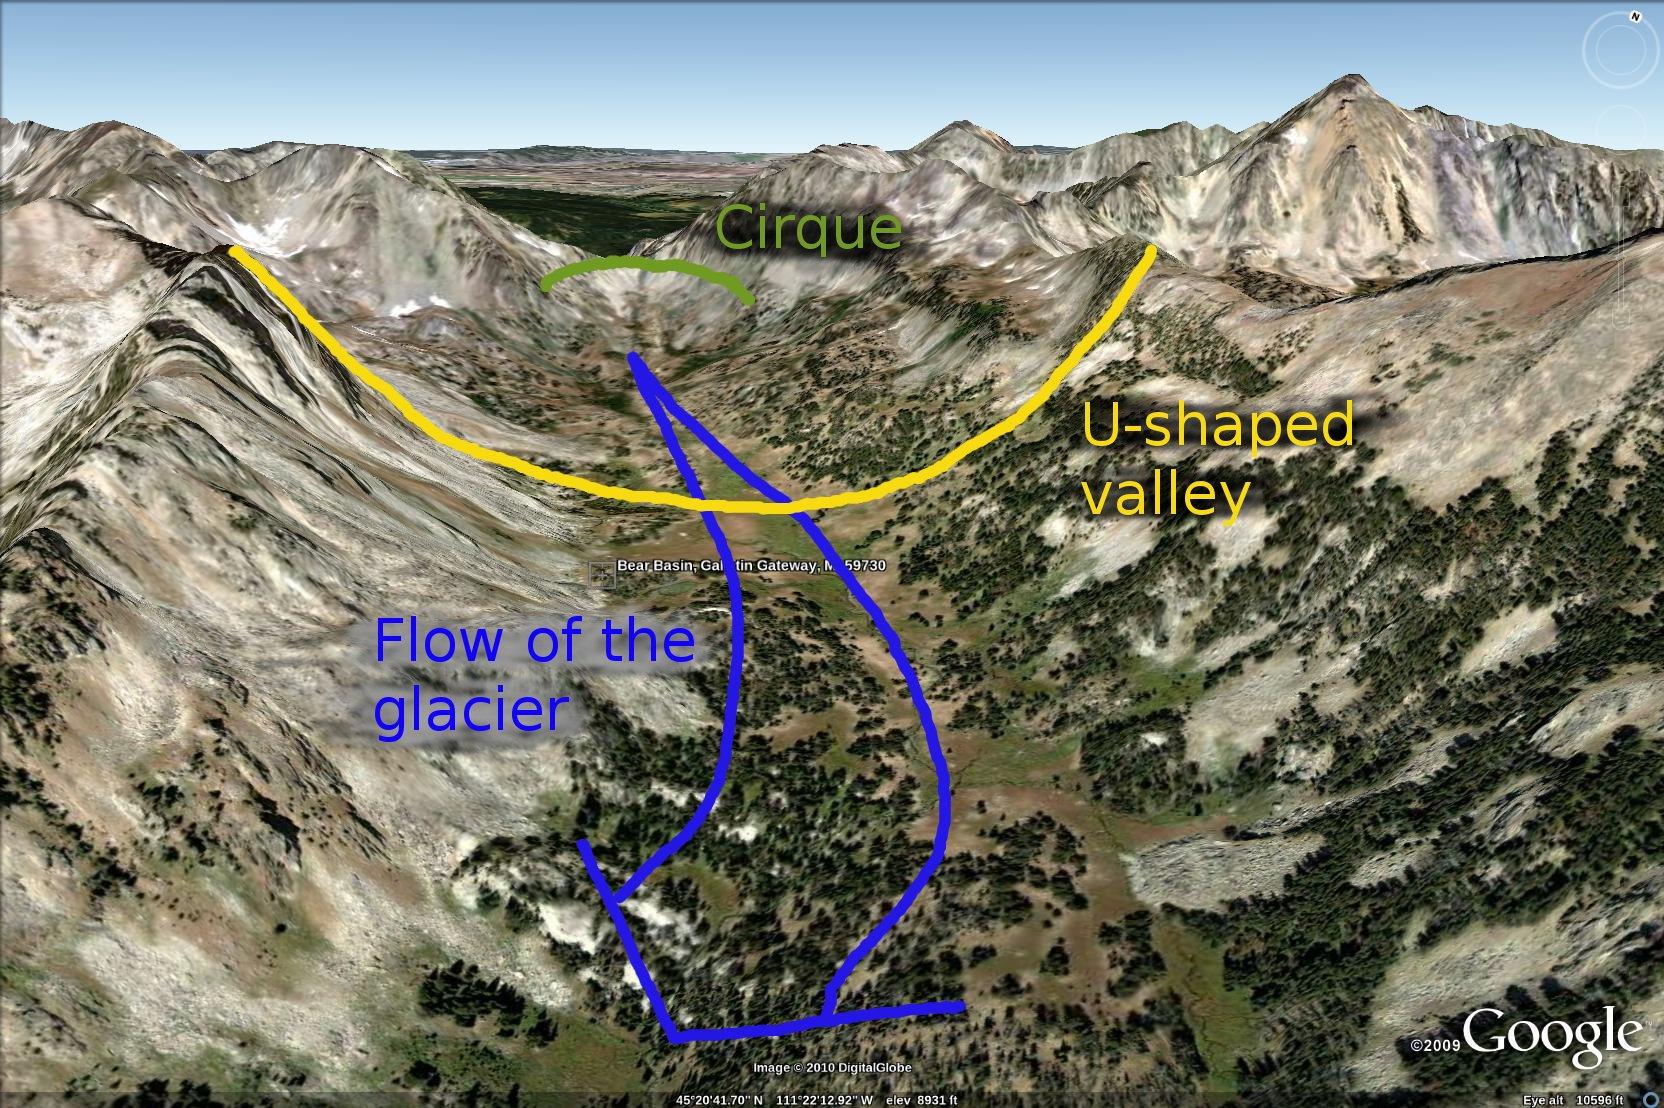 cirque glacier diagram nissan pulsar n15 radio wiring bear basin